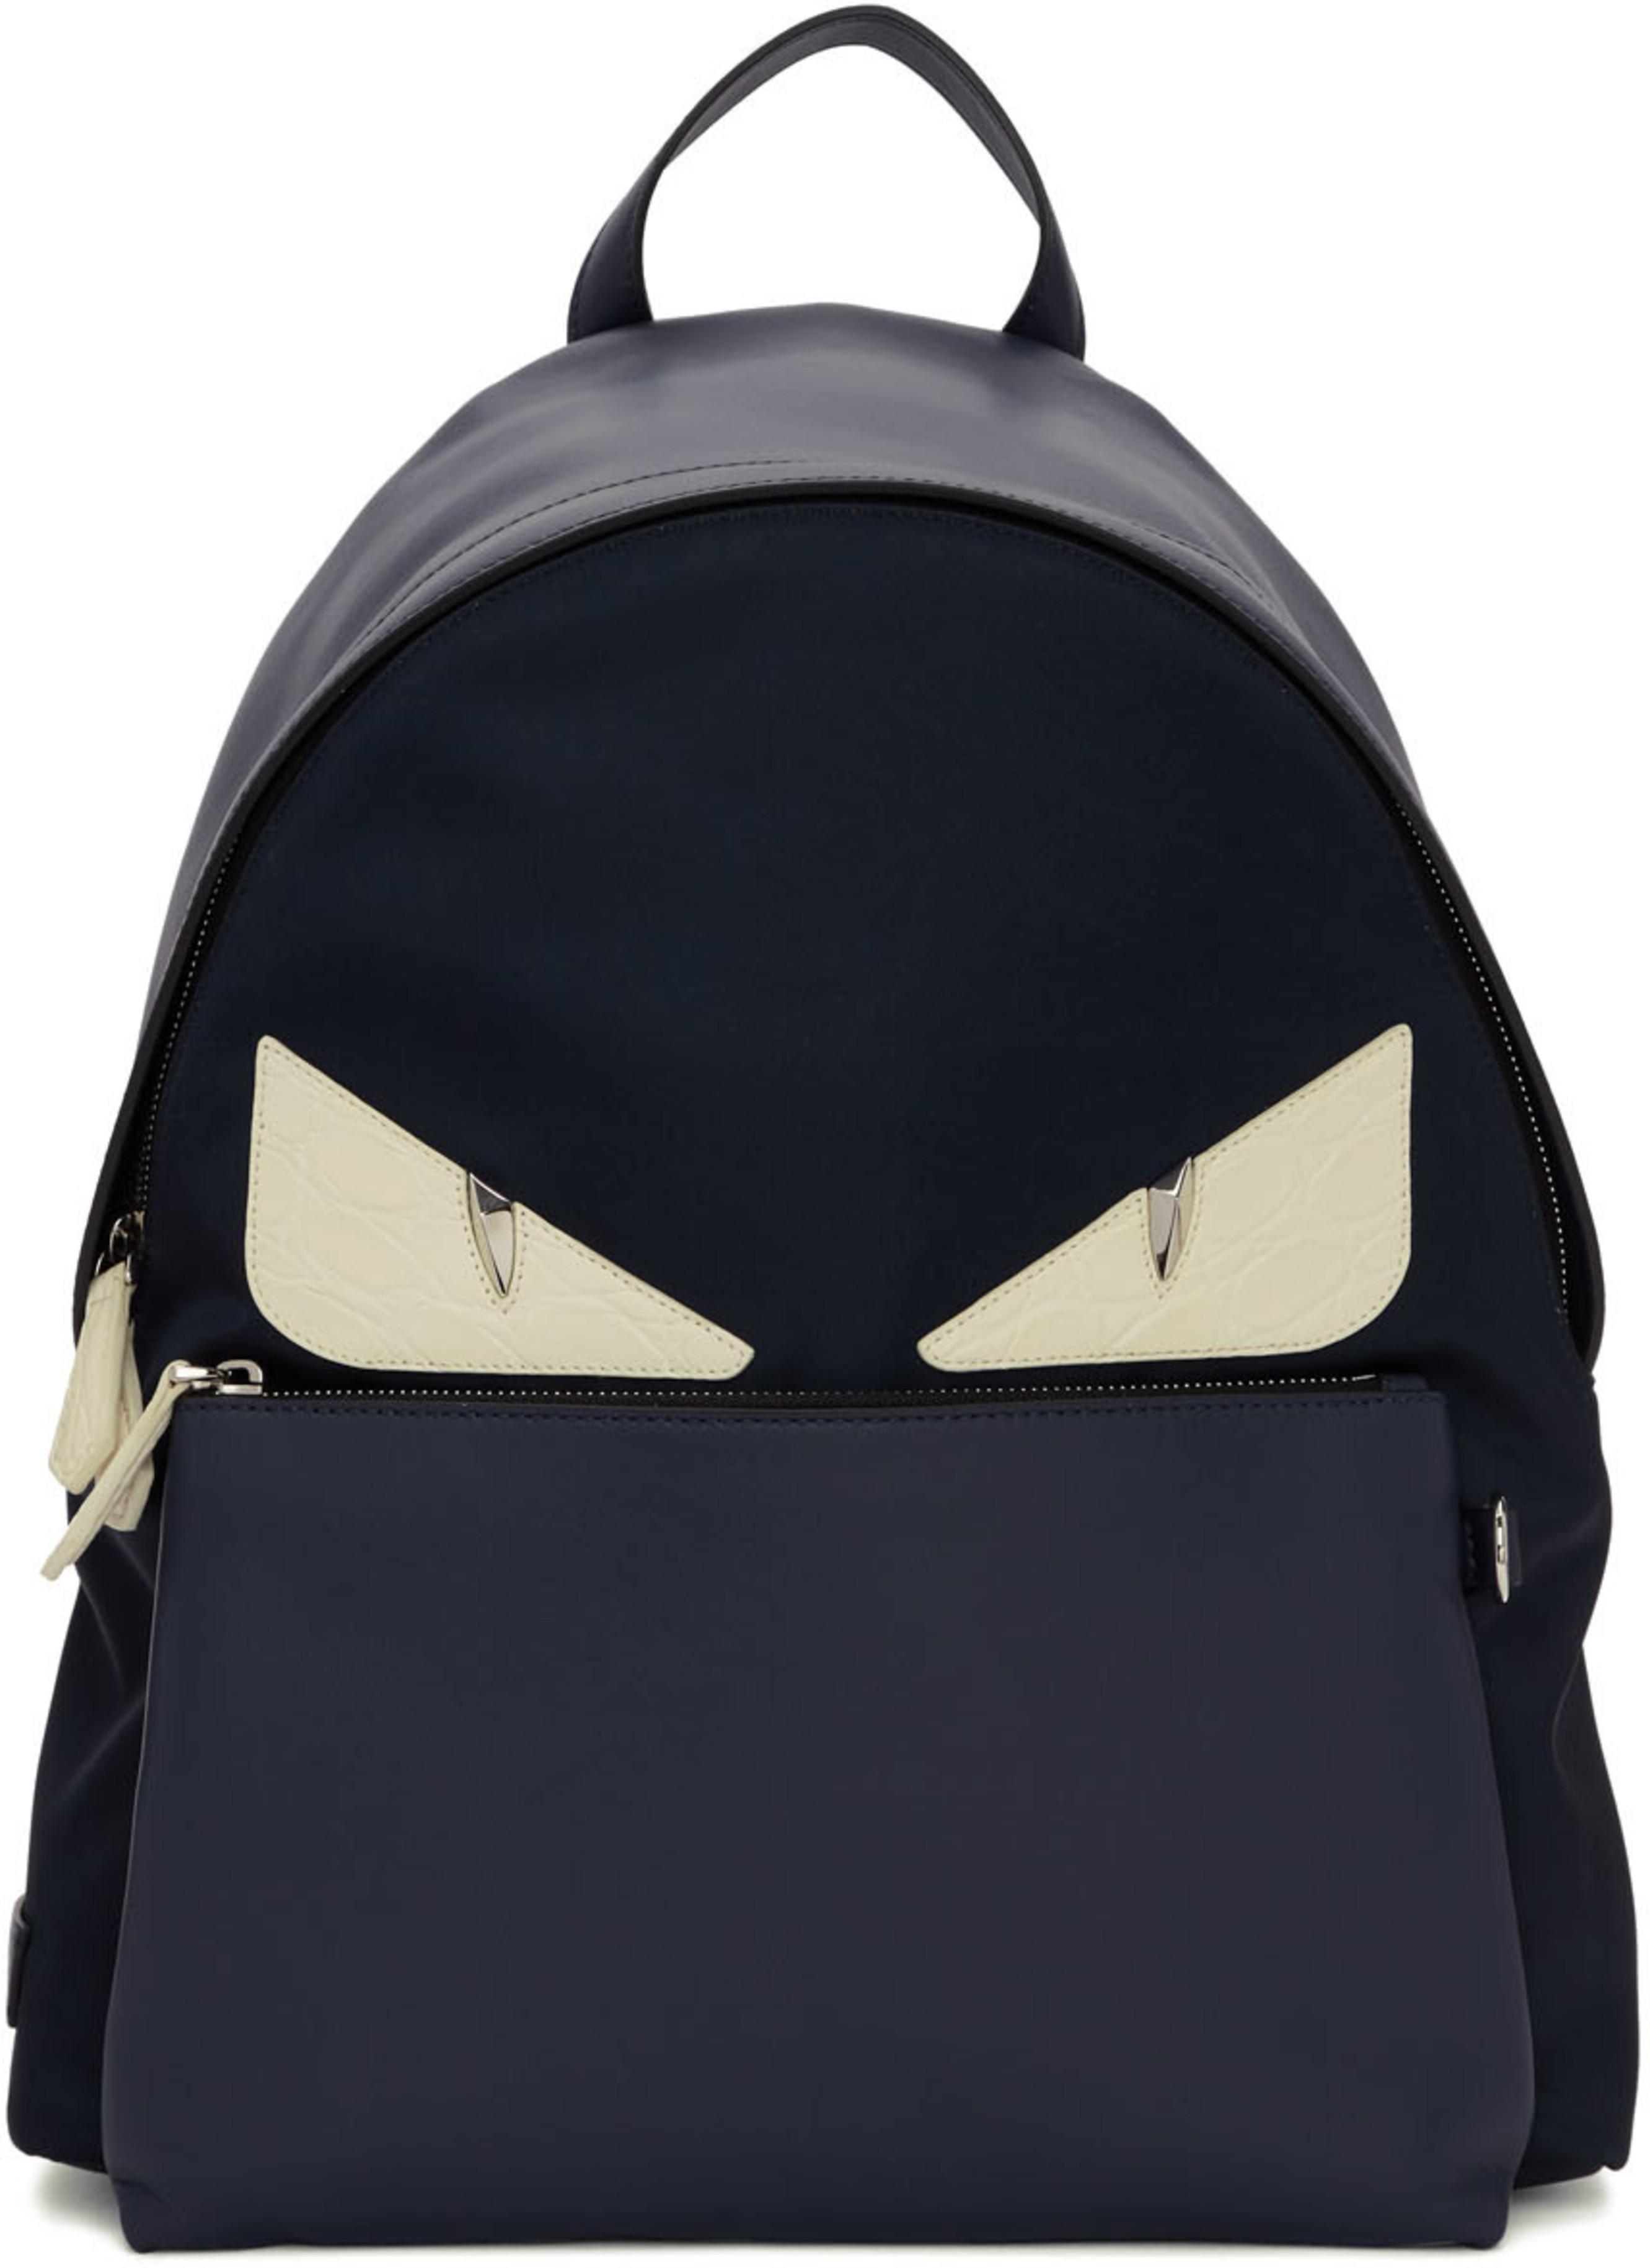 quality design c4640 8d3b2 Navy Bag Bugs Backpack